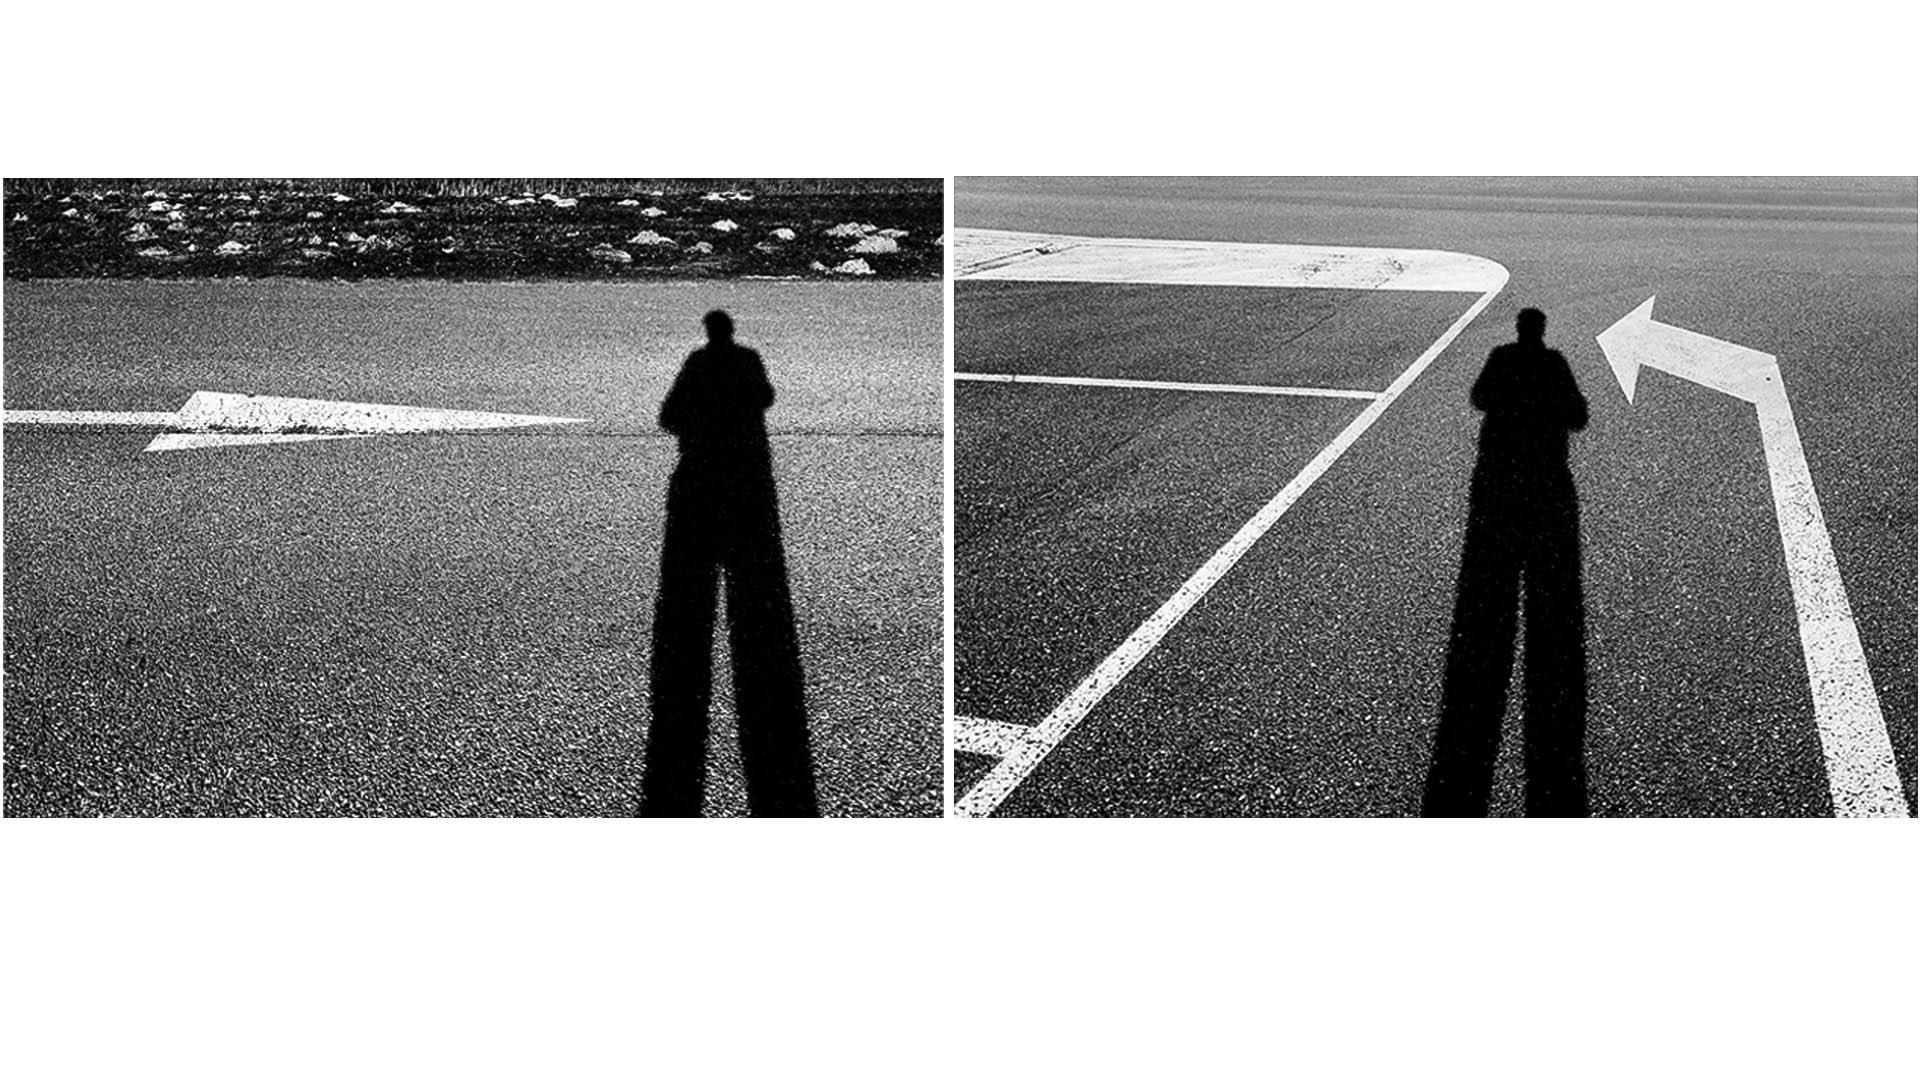 Me-and-my-shadow.jpg